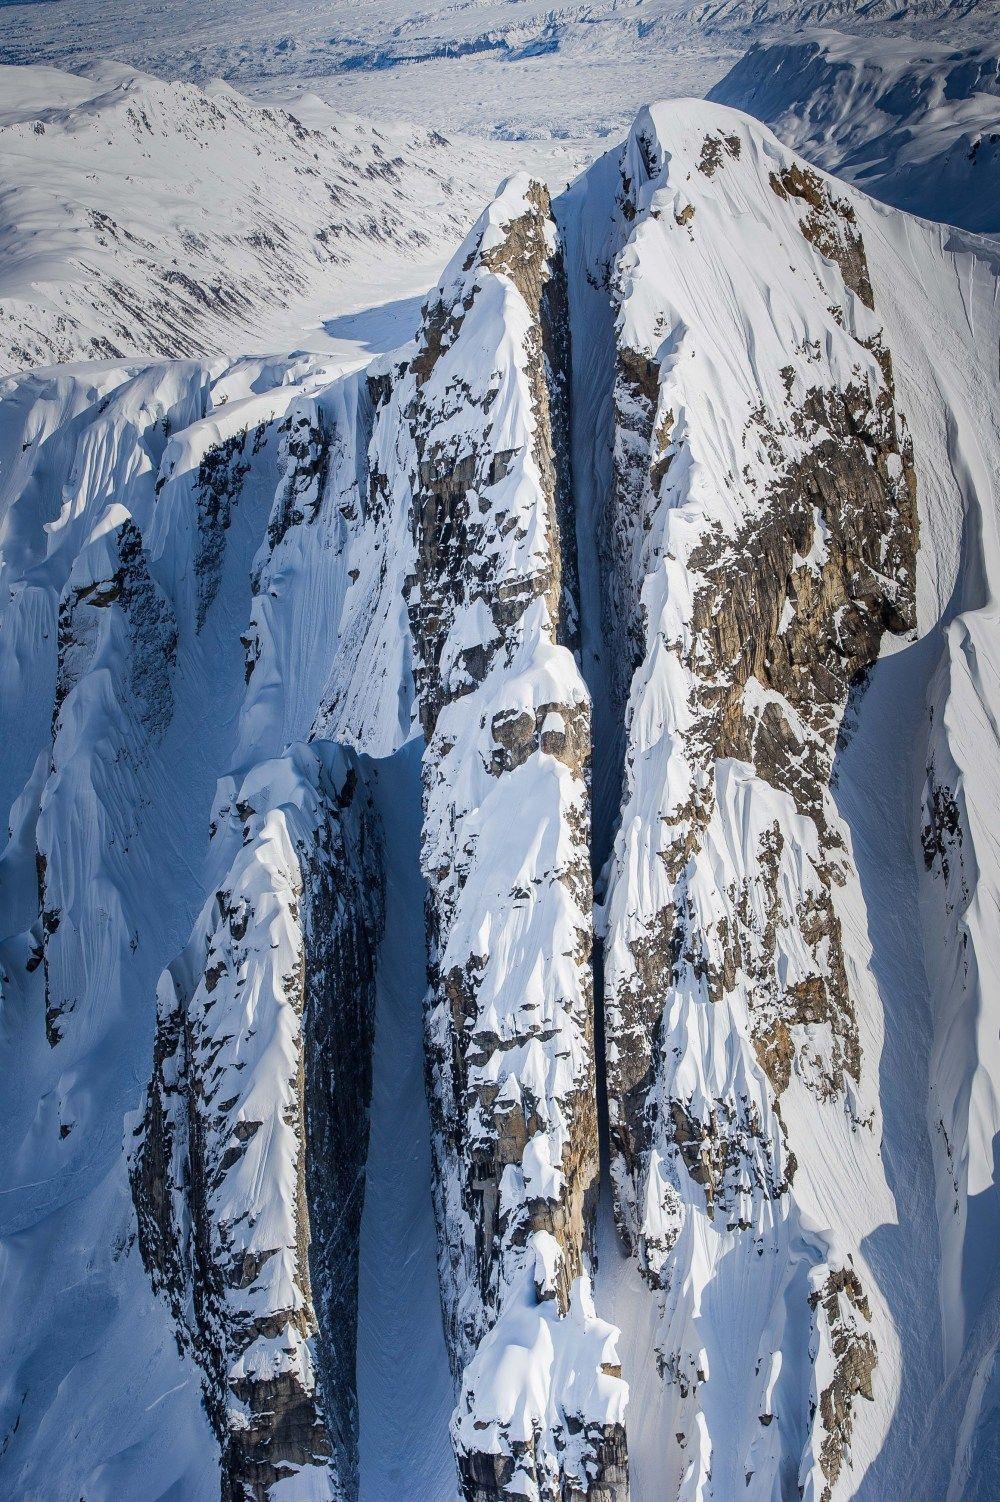 Photos Of The Year Powder Magazine Skiing Extreme Sports Photo [ 1502 x 1000 Pixel ]